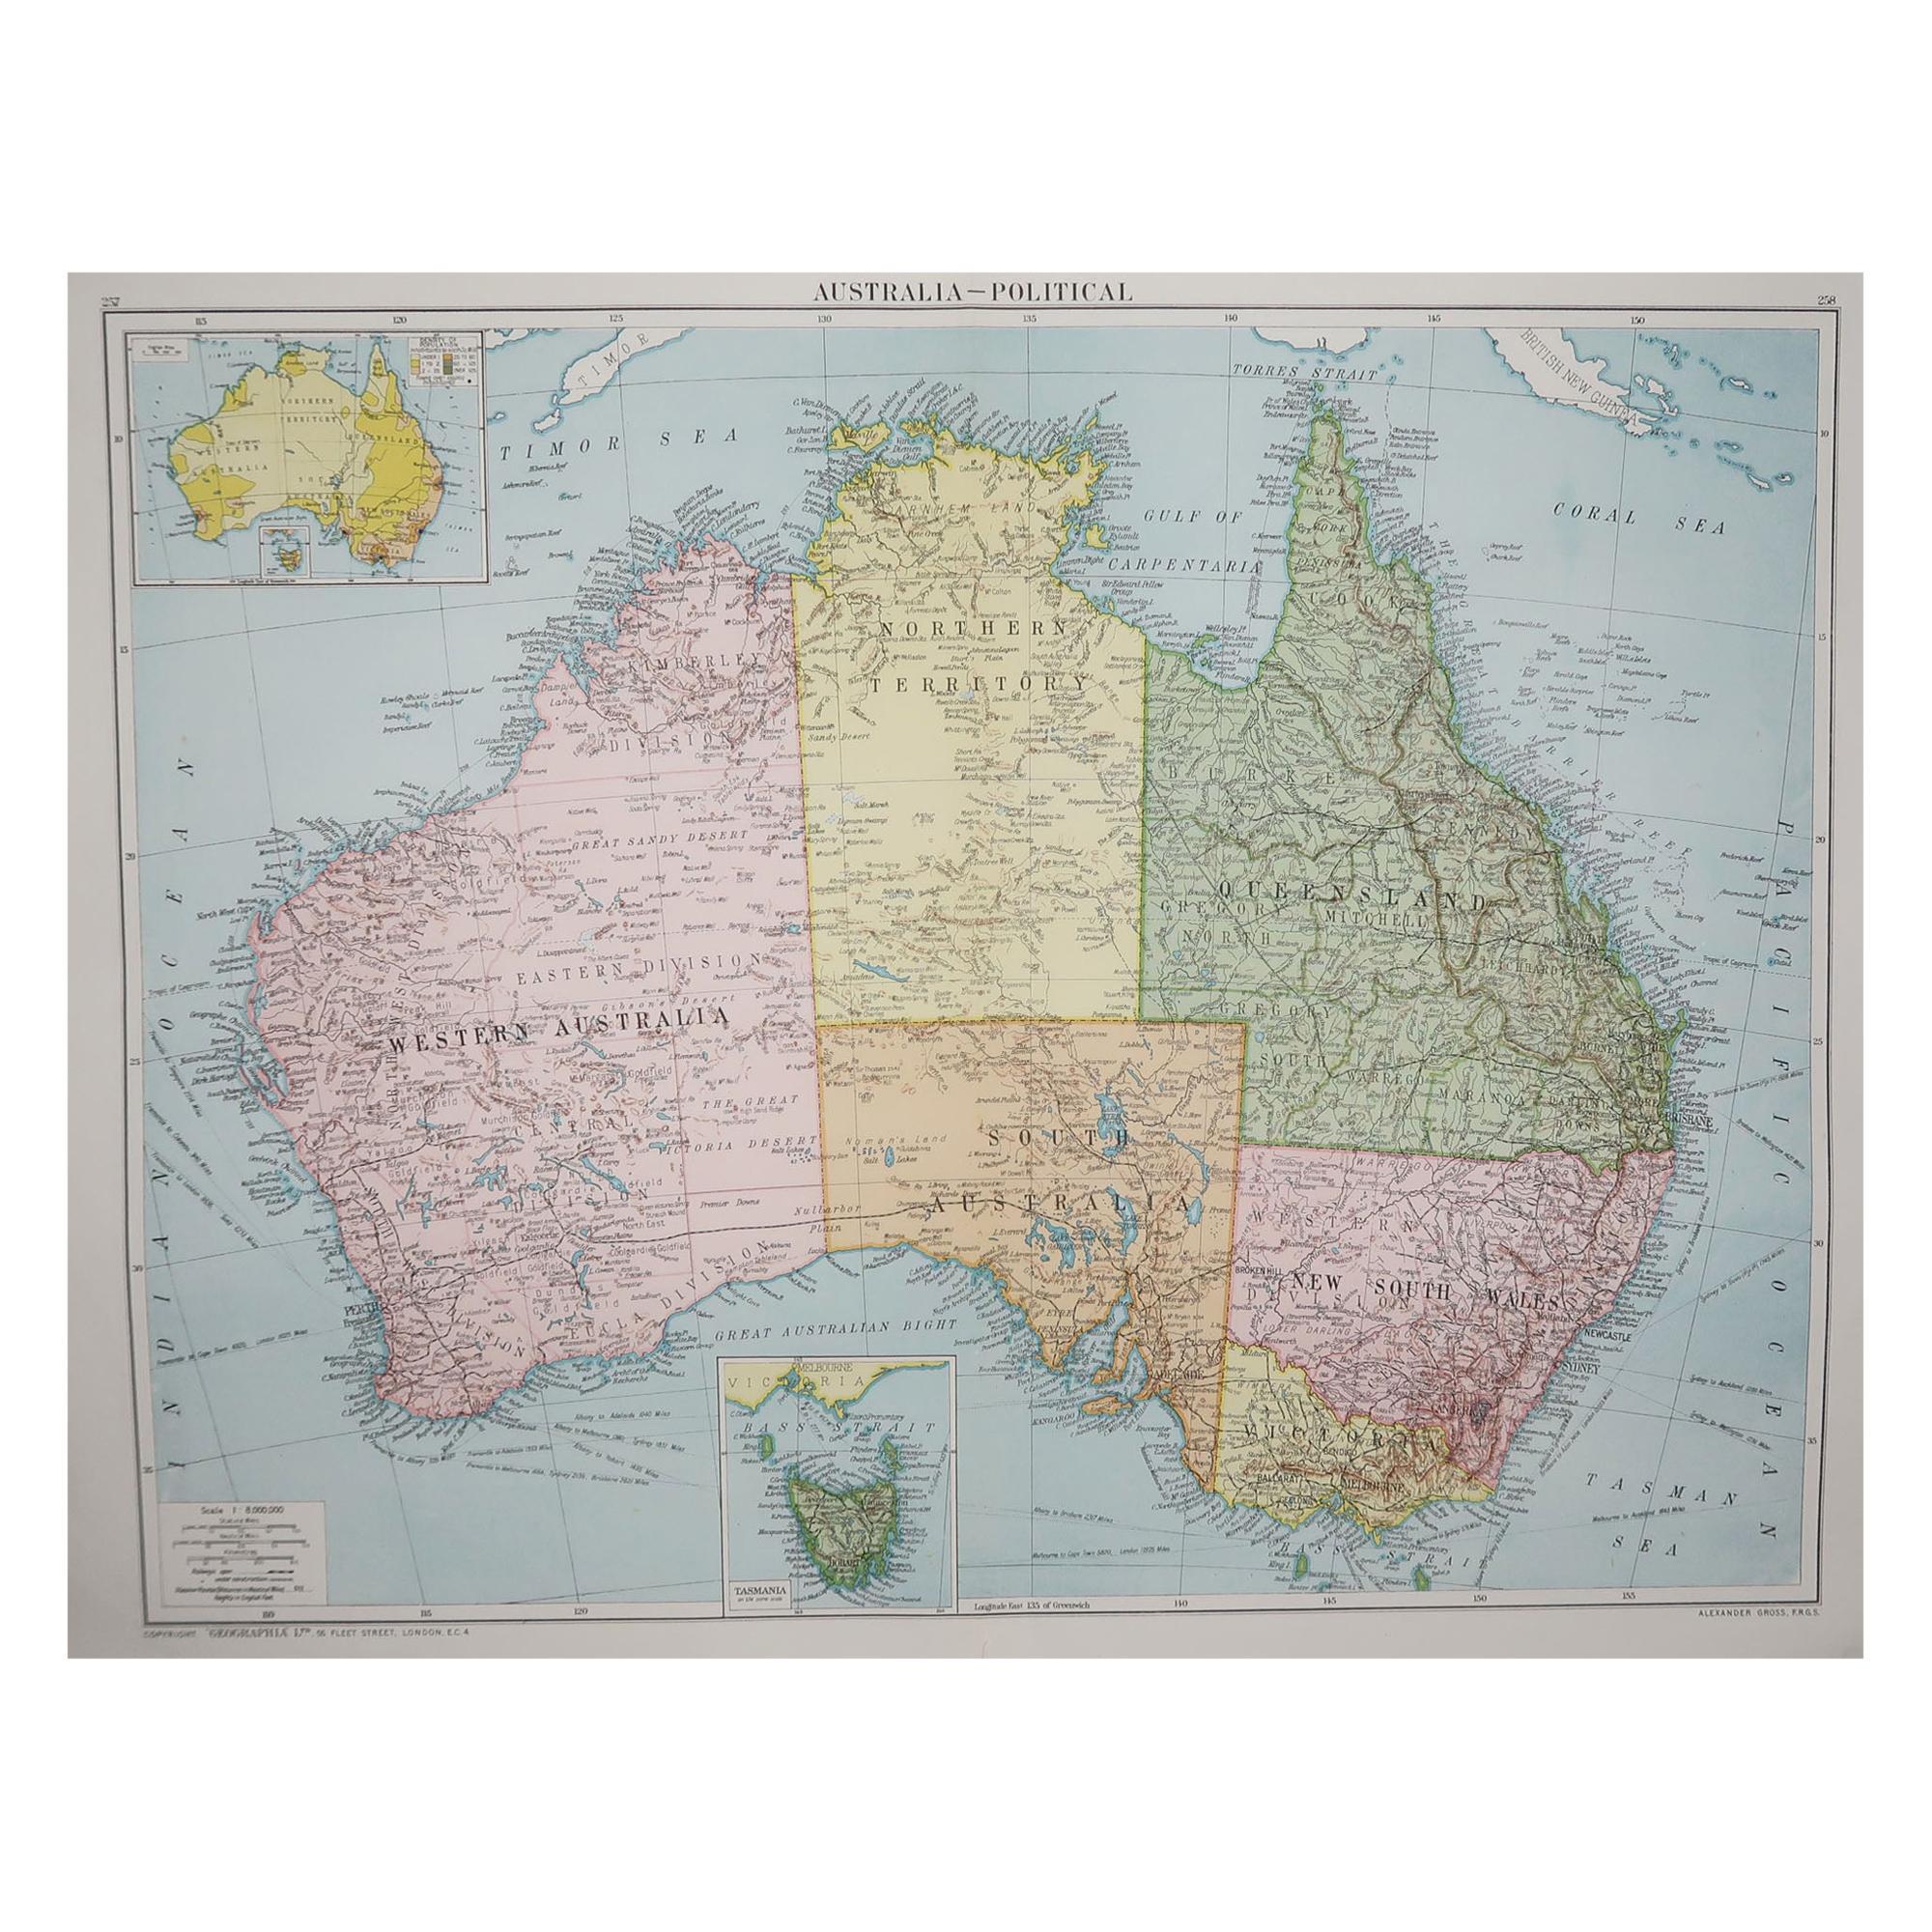 Large Original Vintage Map of Australia, circa 1920